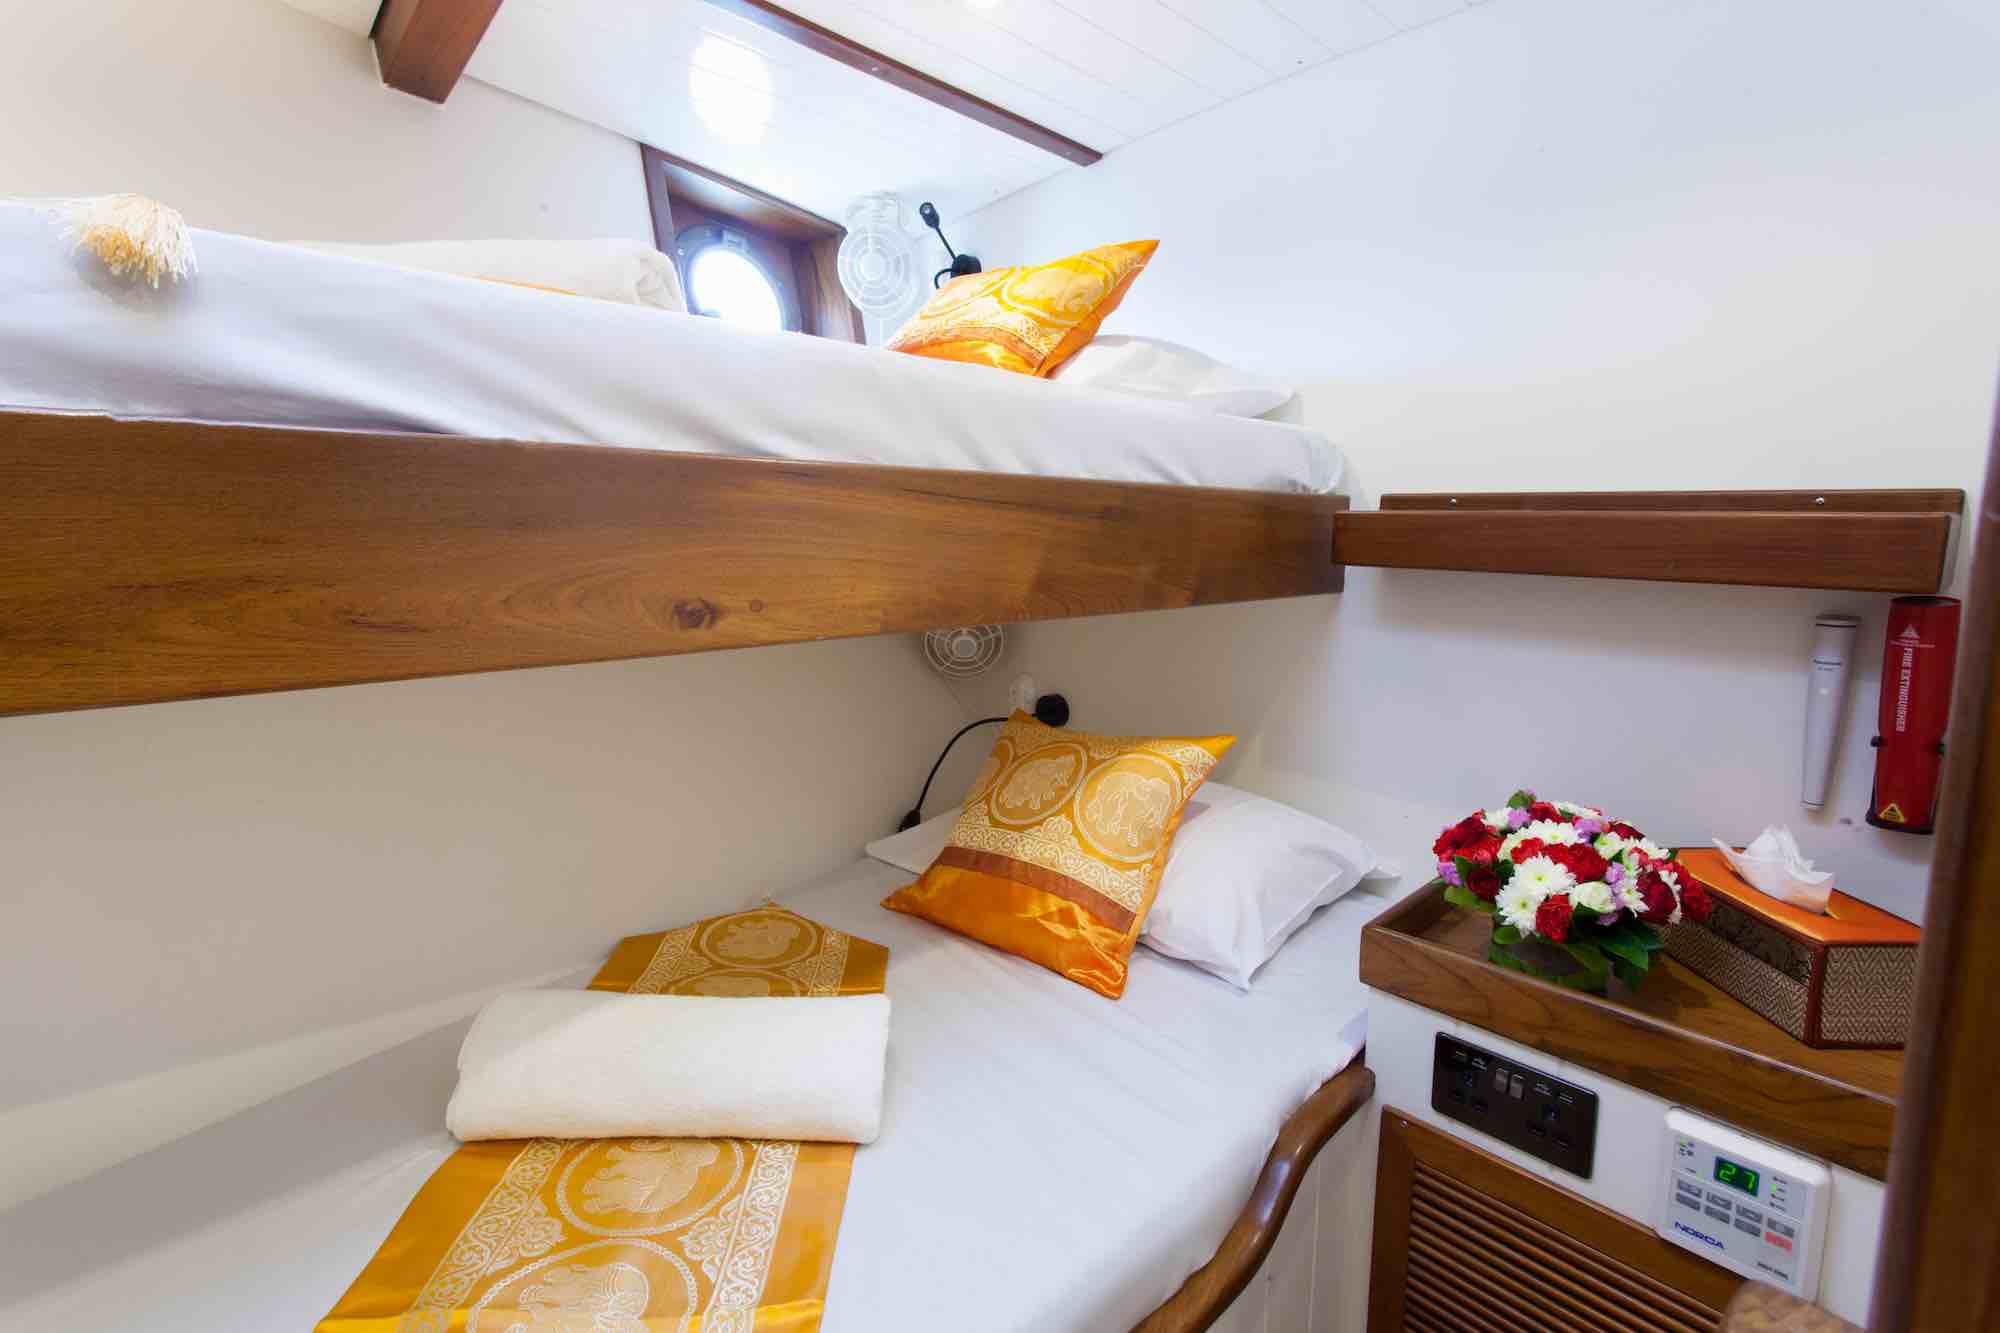 Dallinghoo_guest cabin bunk bed yellow throw pillows sailing in Mergui 2_XS.jpeg